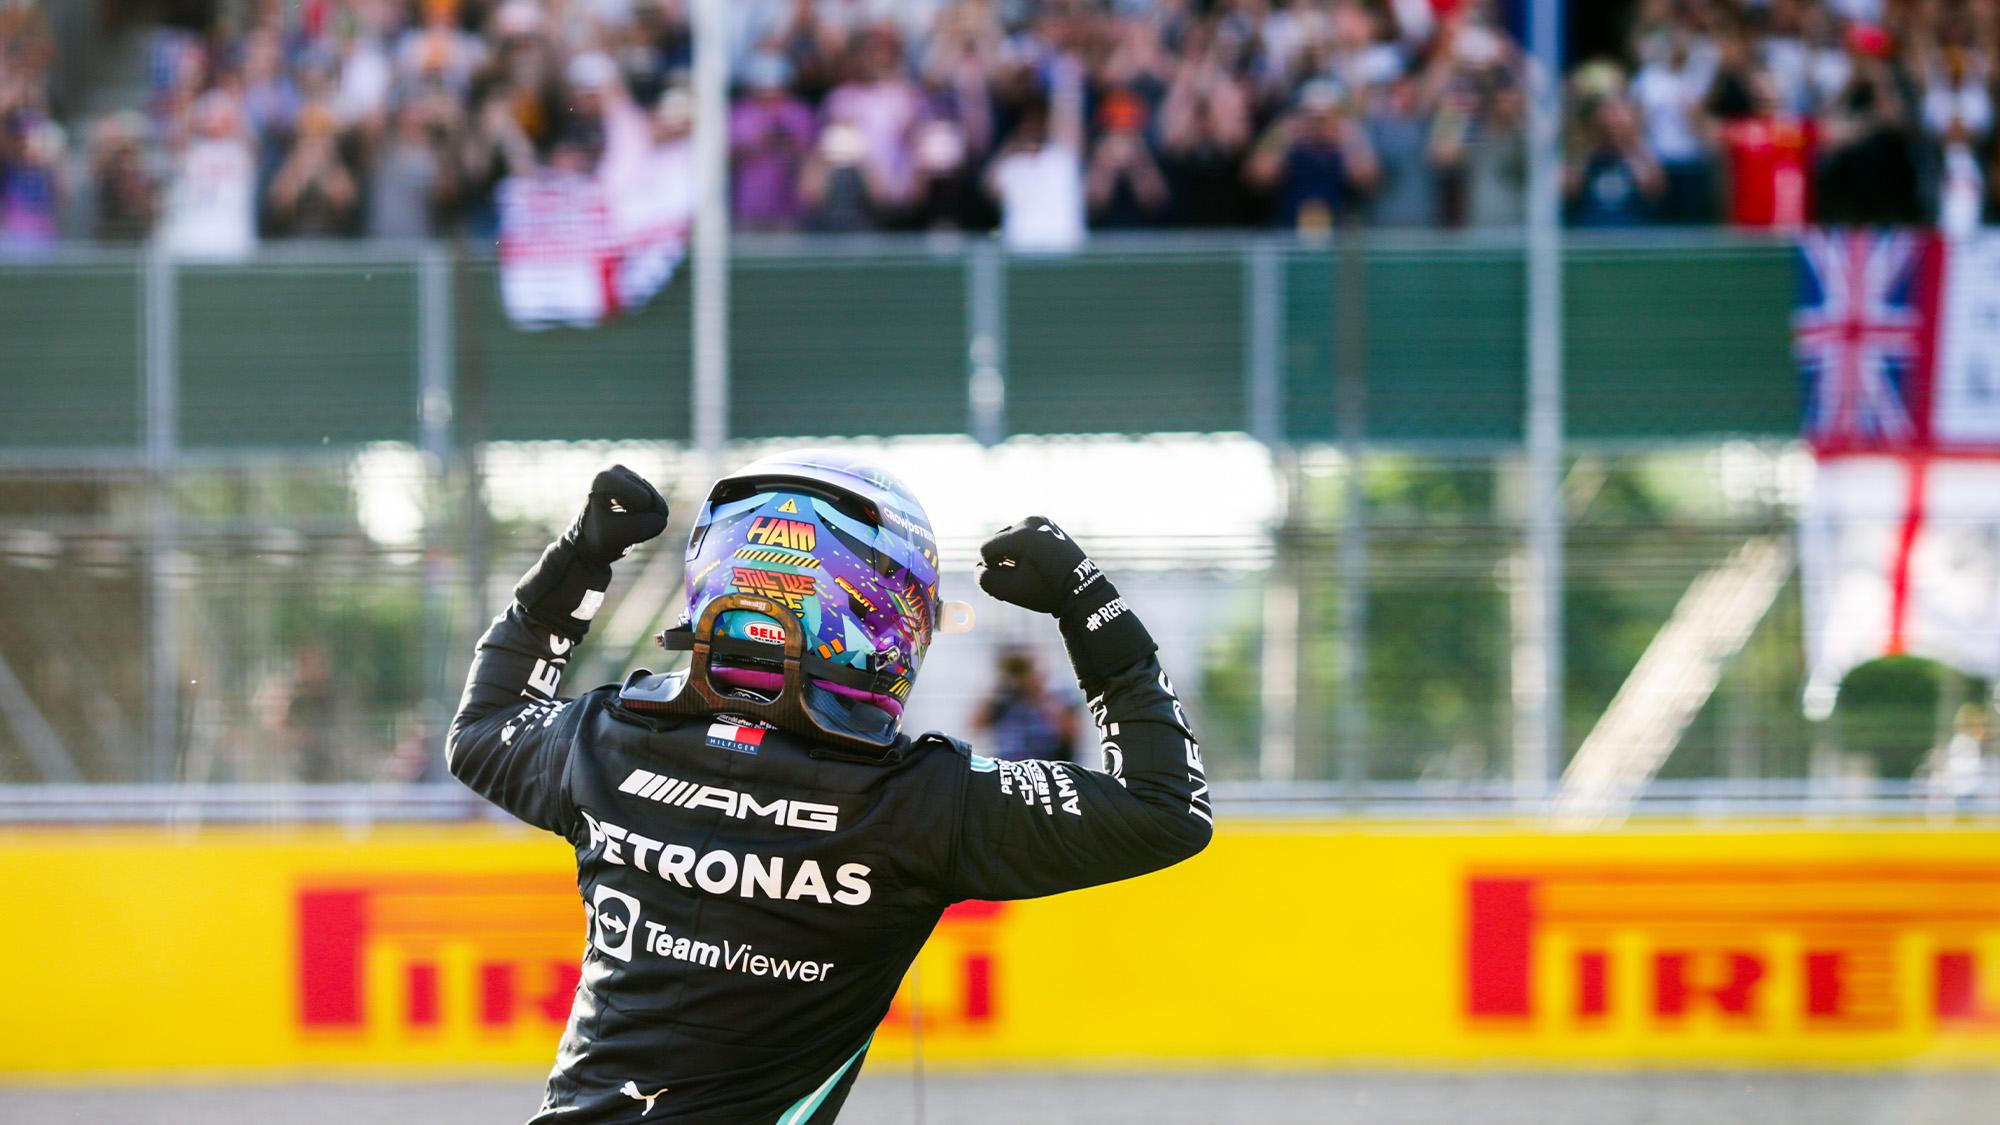 Lewis Hamilton celebrates after 2021 British Grand Prix qualifying